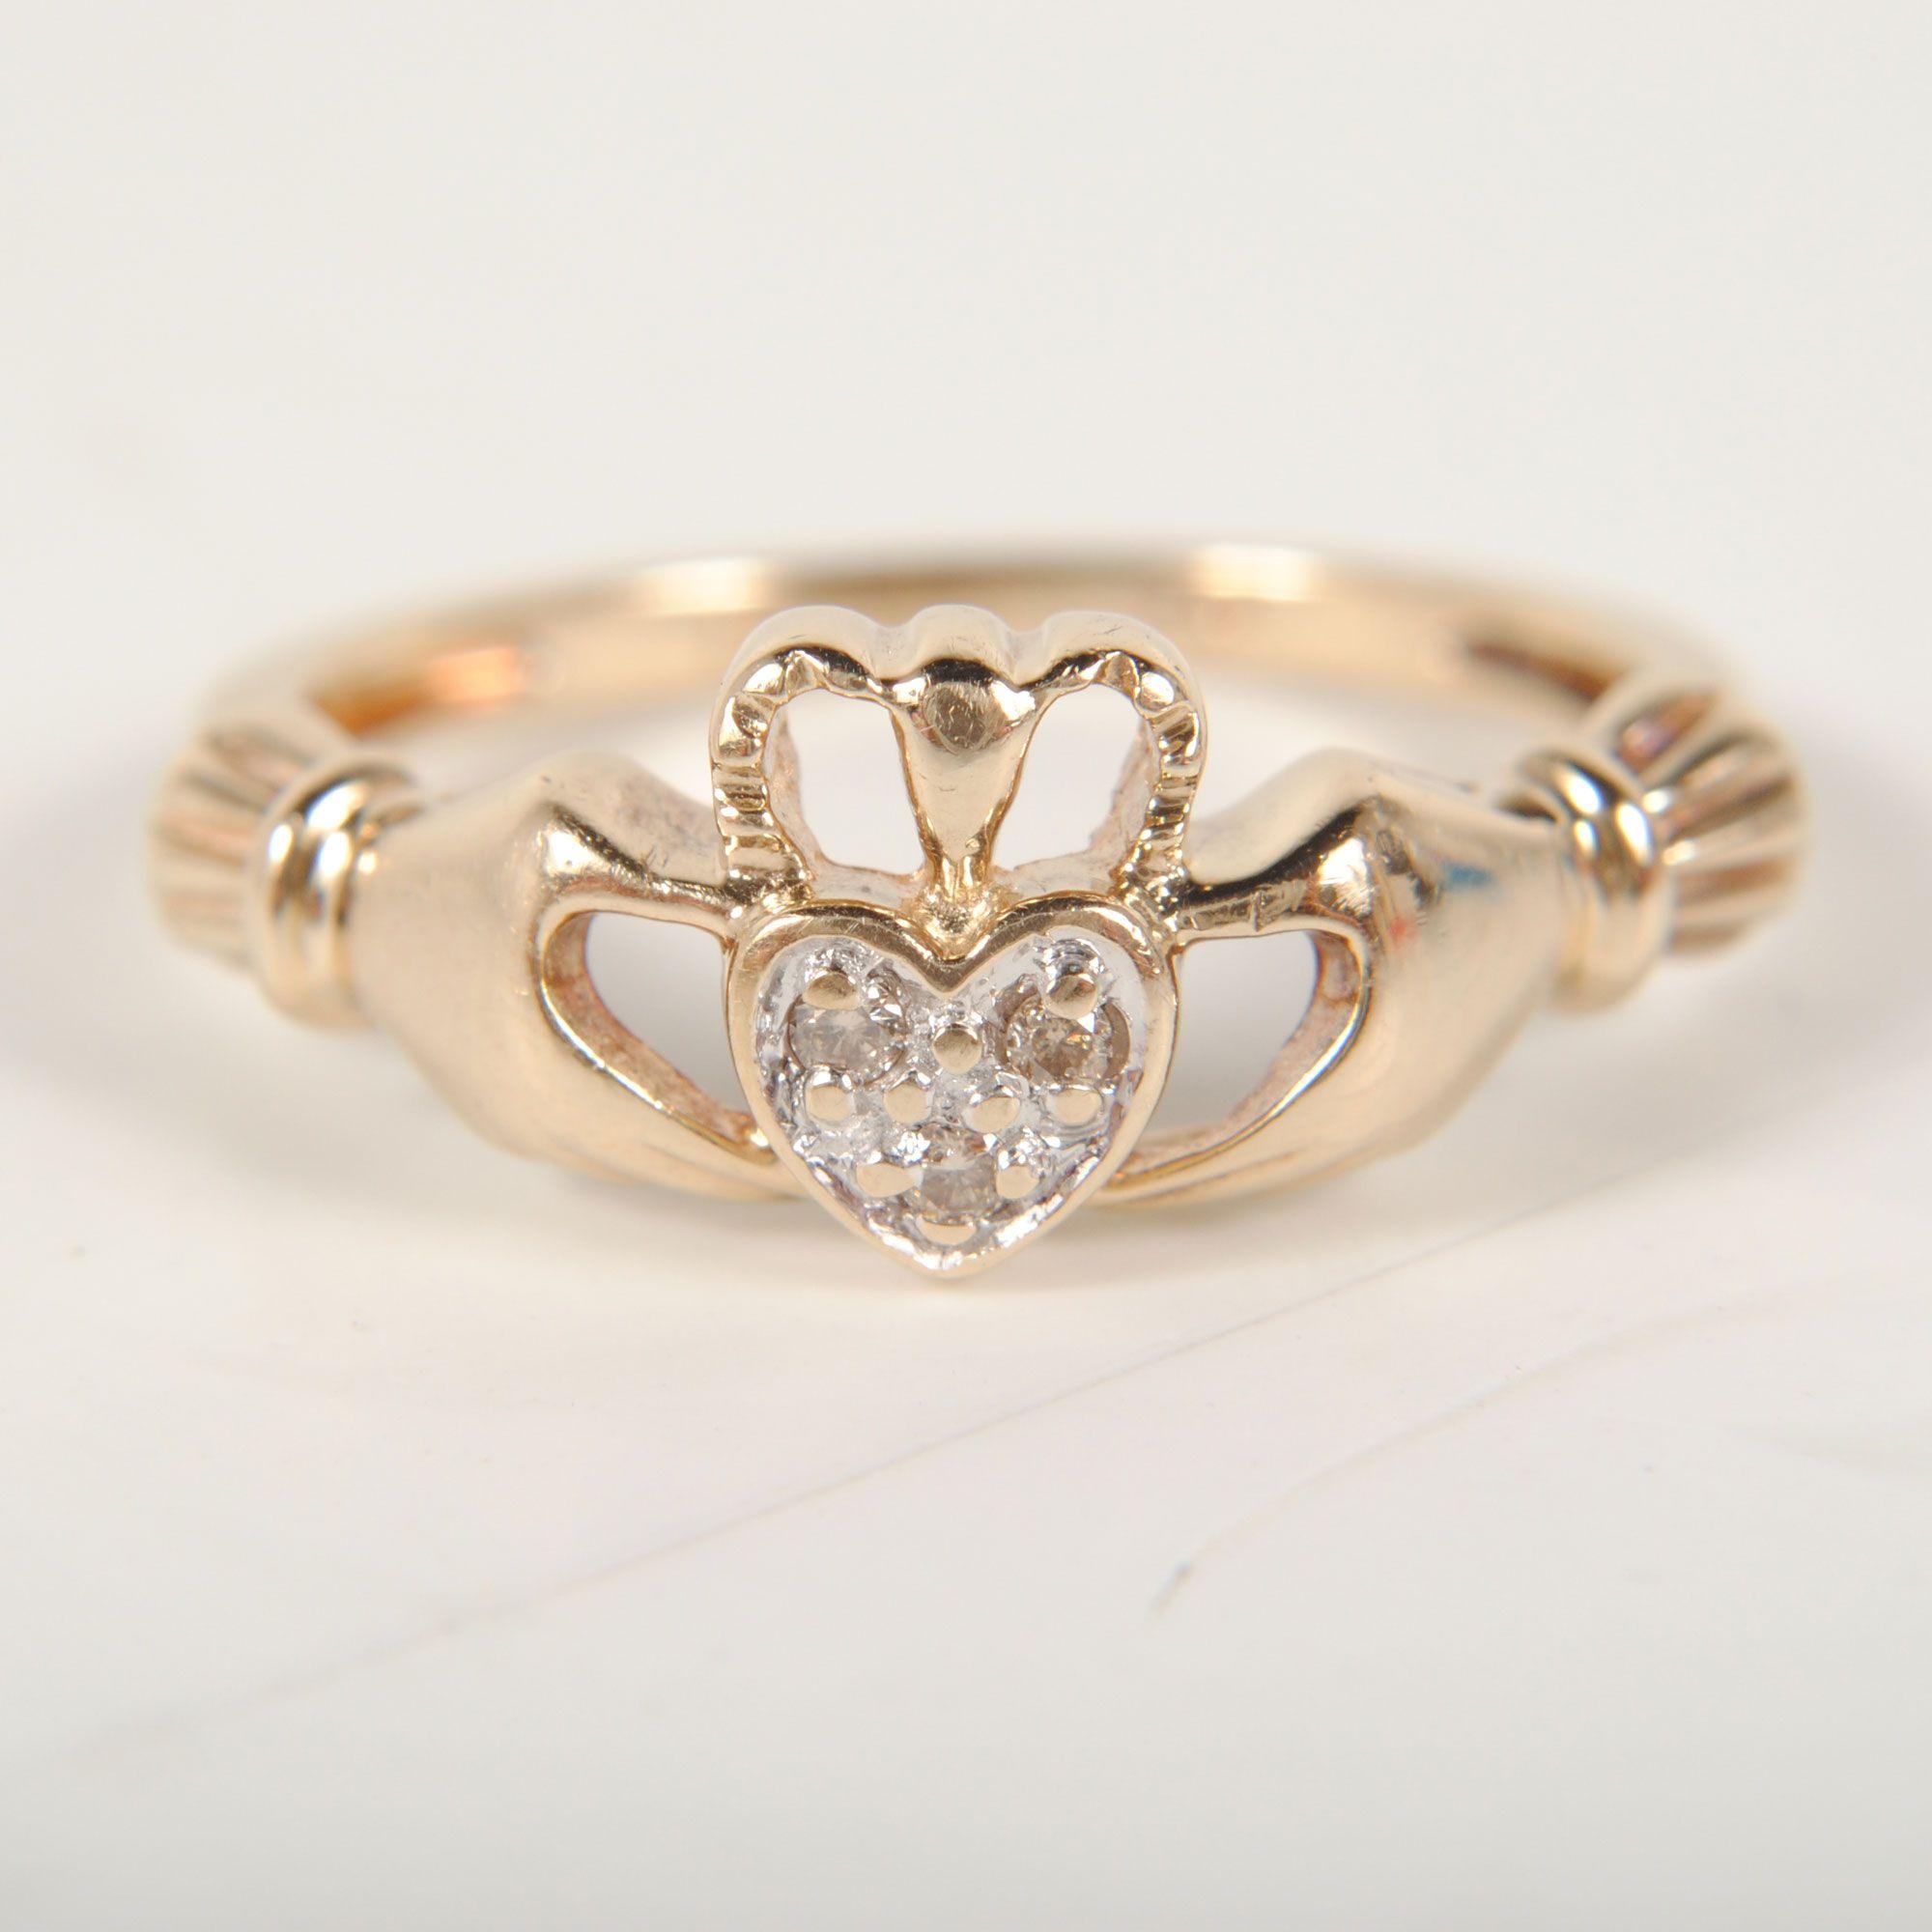 Ladies 10k Yellow Gold Diamond Claddagh Ring Size 5   1.0dwt